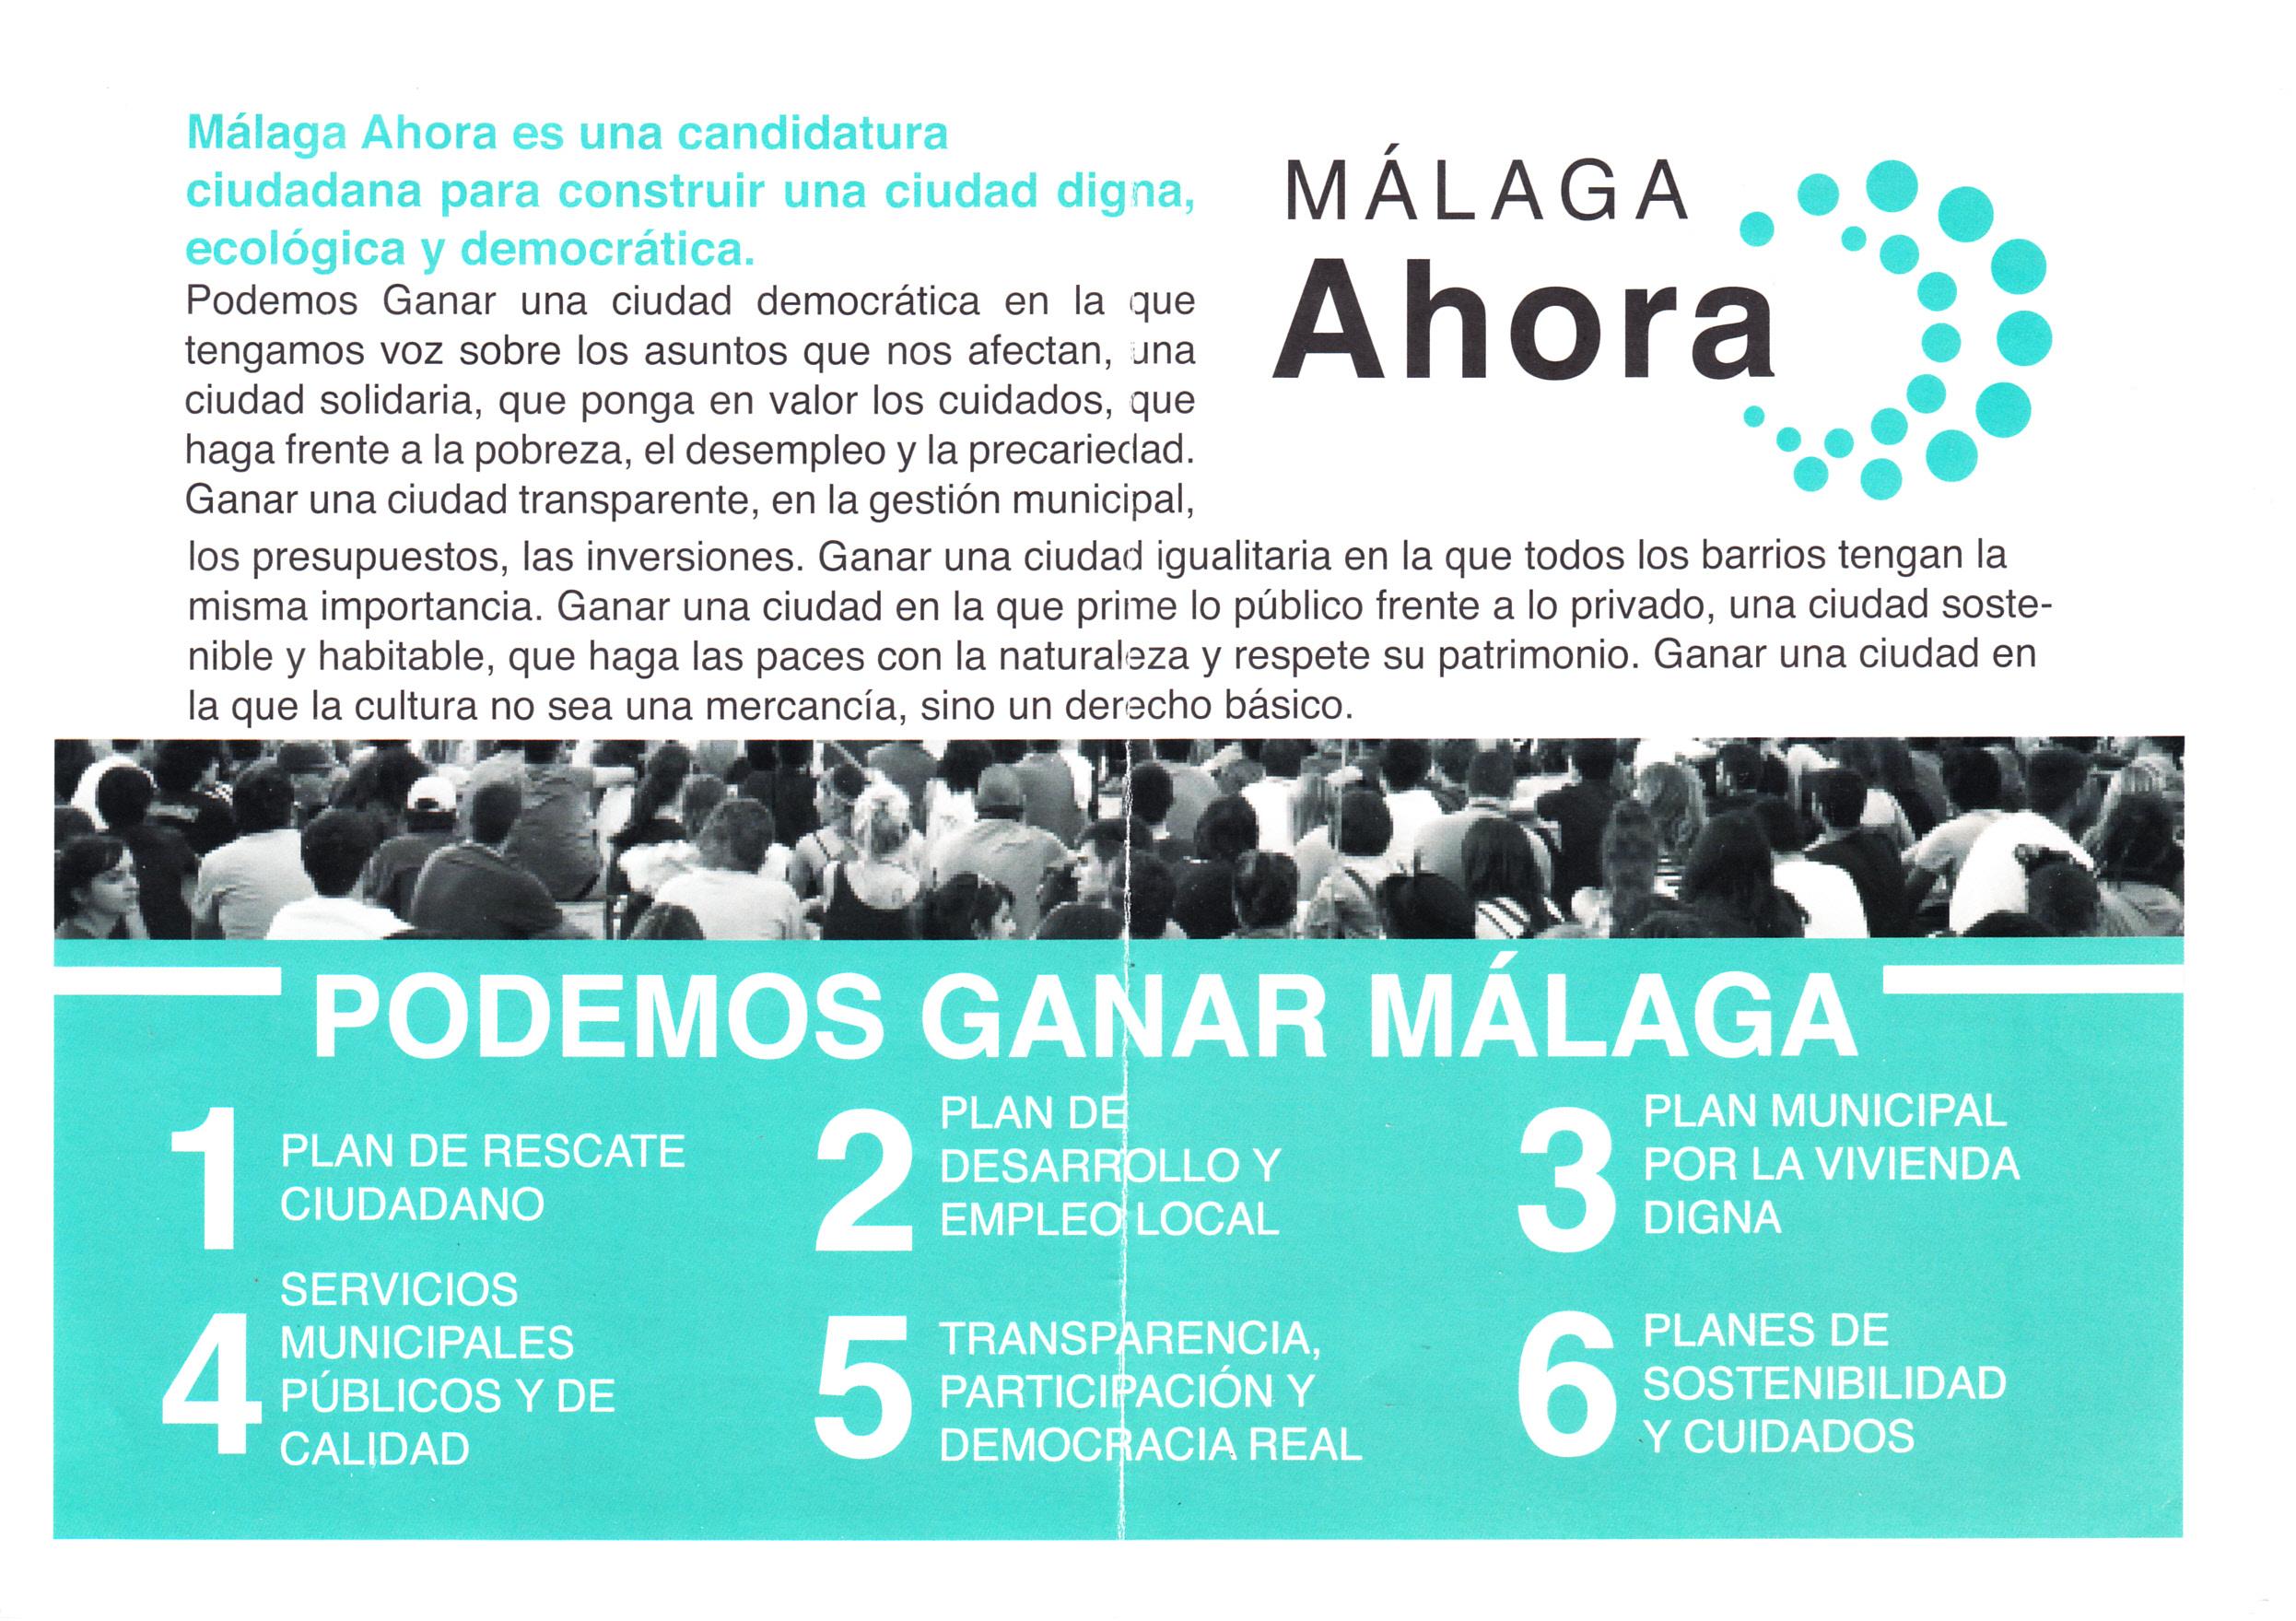 Malaga Ahora_2015_0002